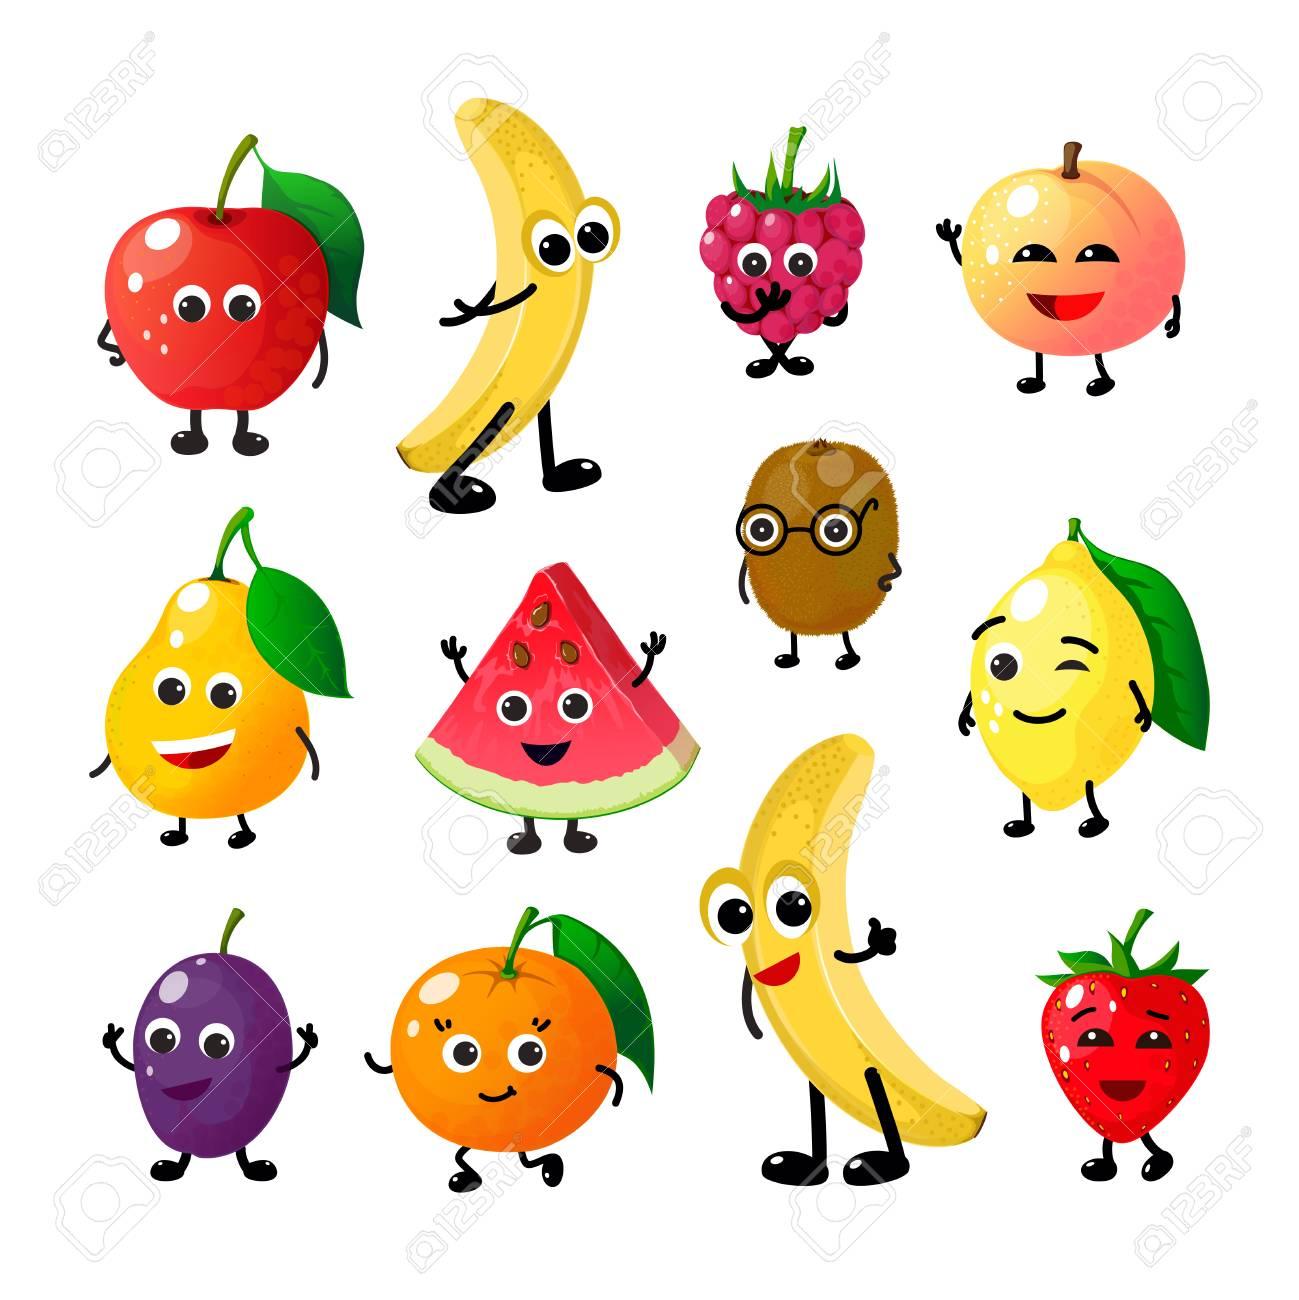 Cartoon funny fruits. Happy apple banana raspberry peach pear watermelon lemon strawberry faces. Summer fruit berry vector characters - 124996779